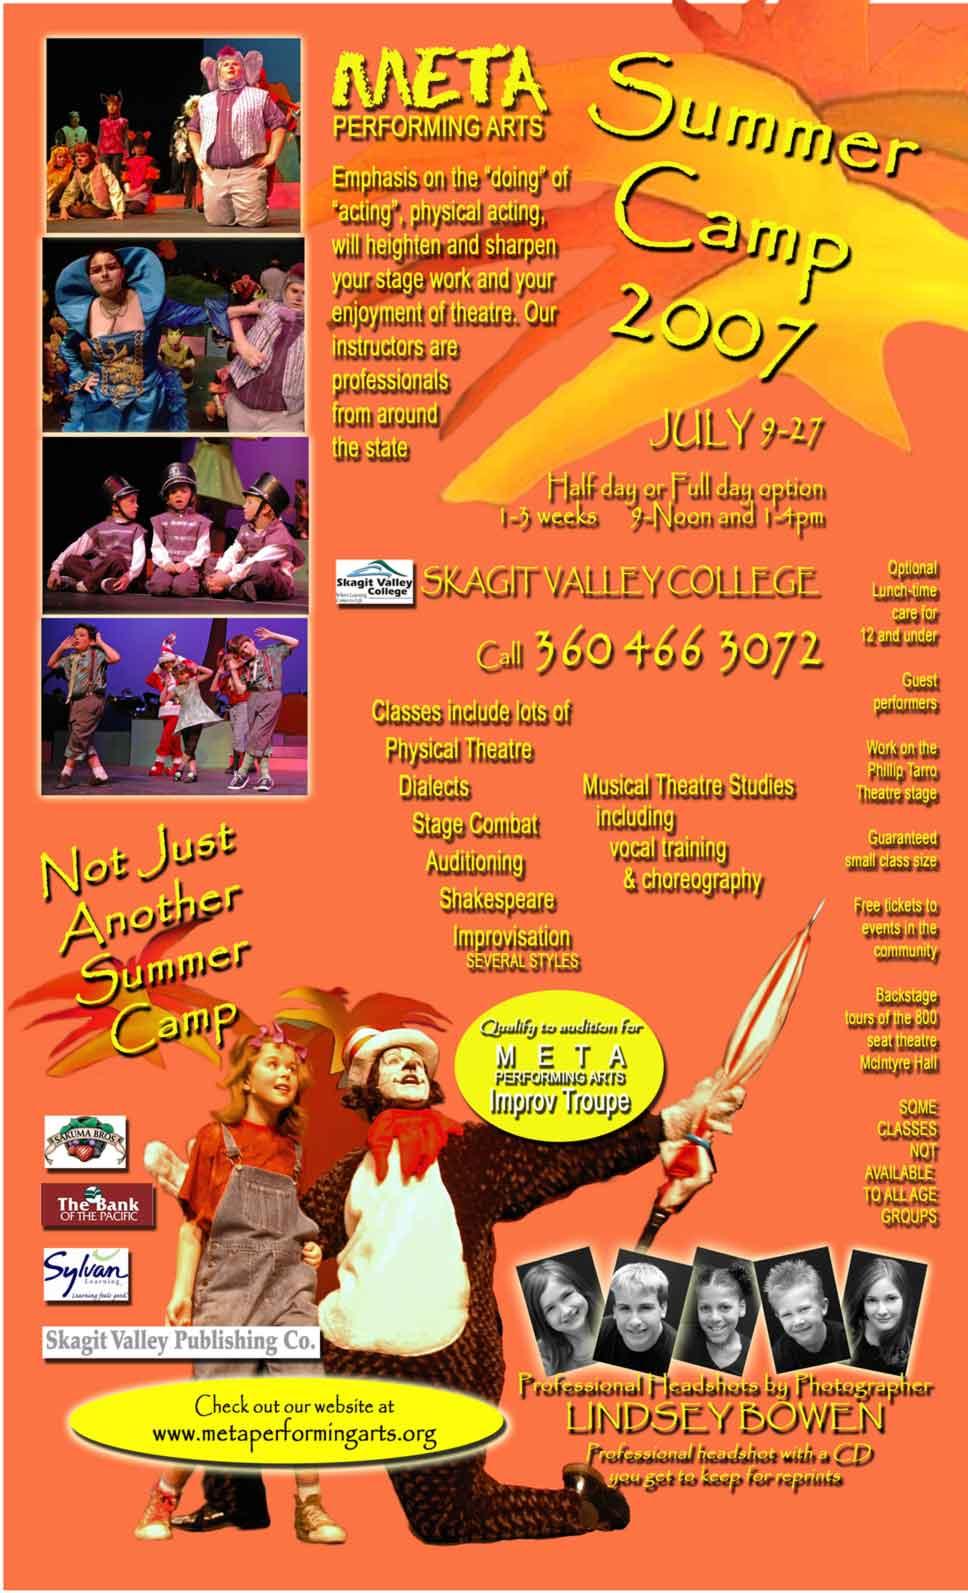 2007-summer-camp.jpg